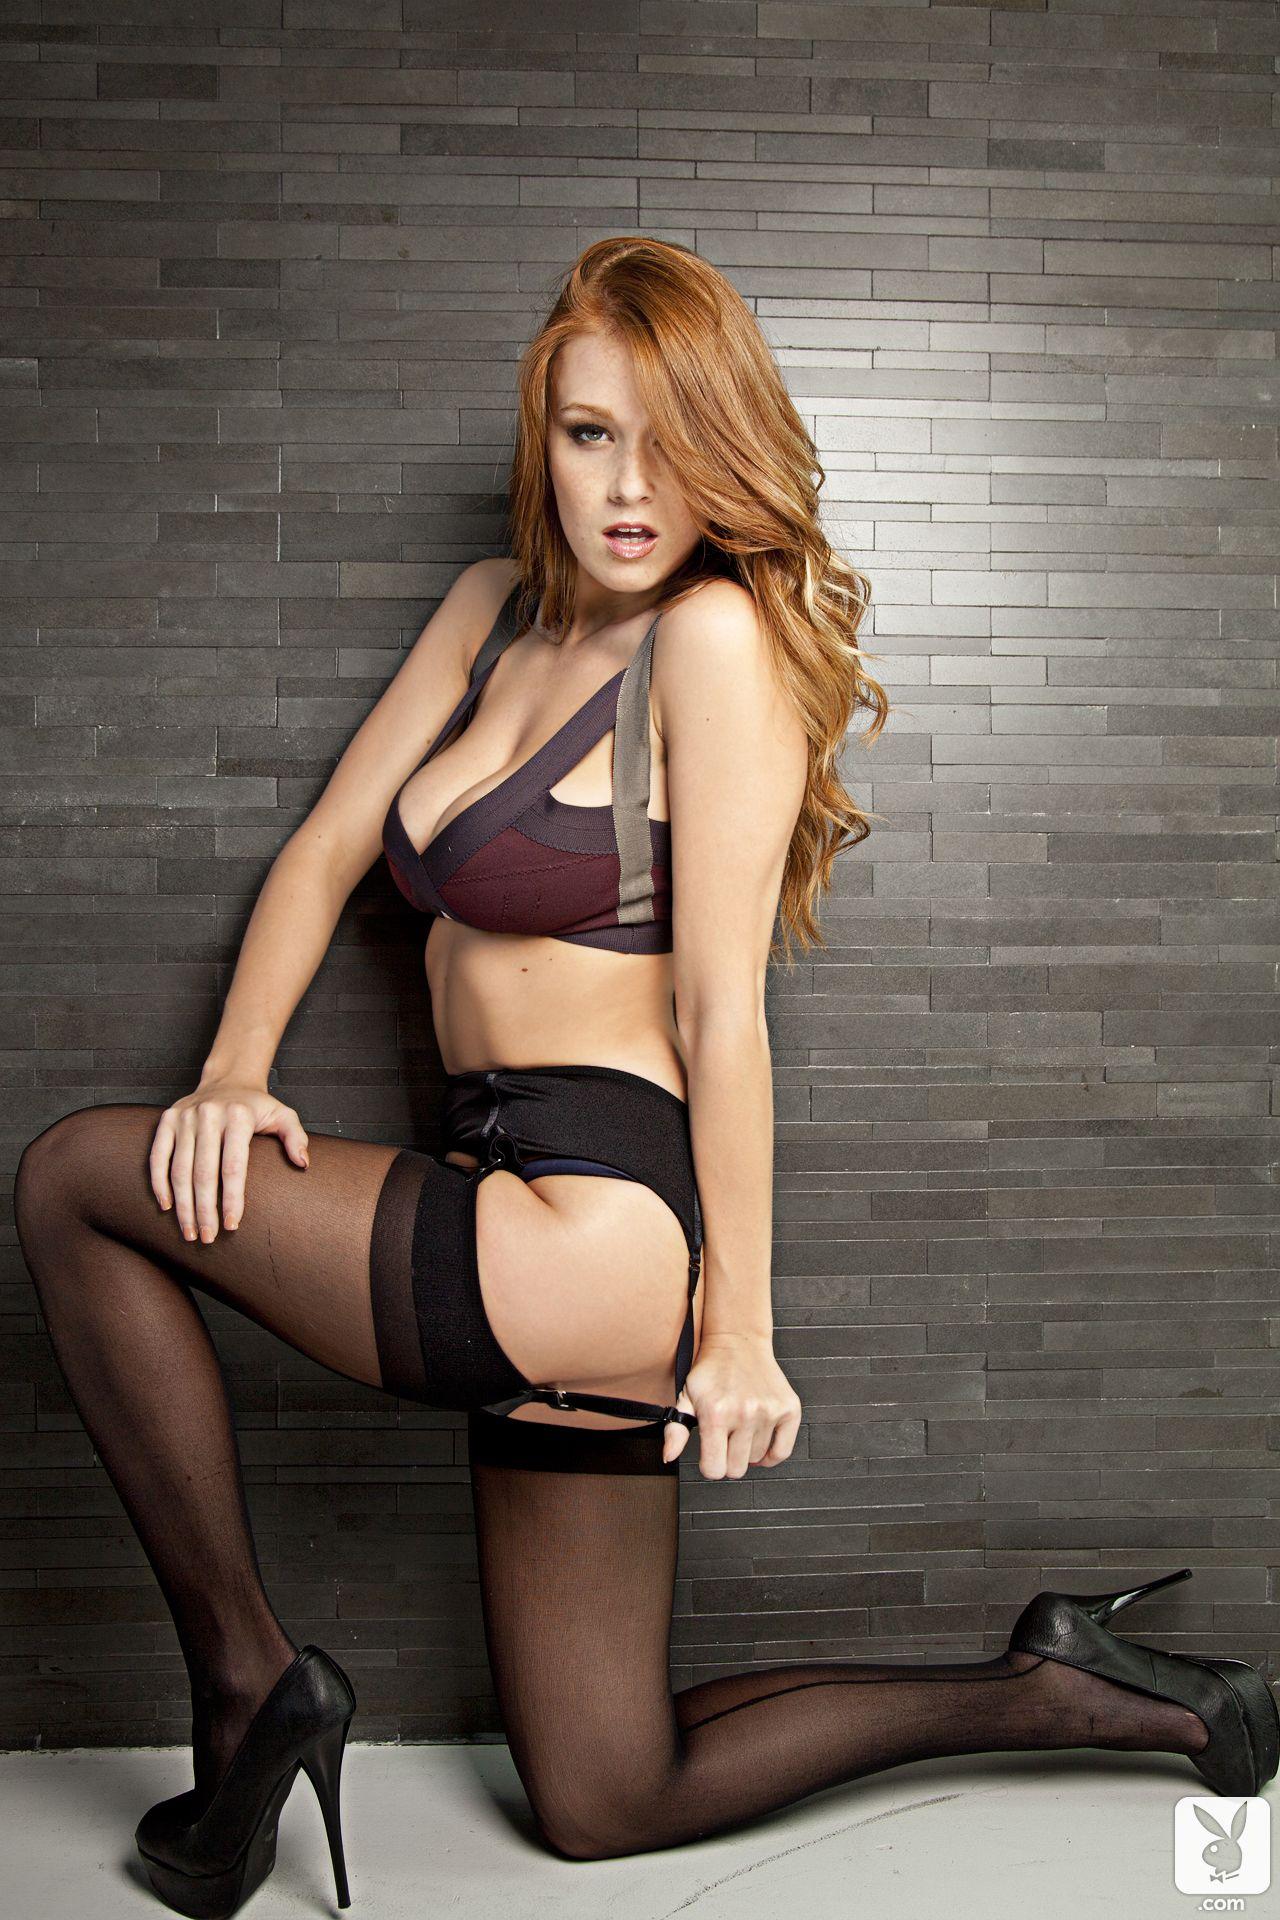 Severance free in photo redhead stocking